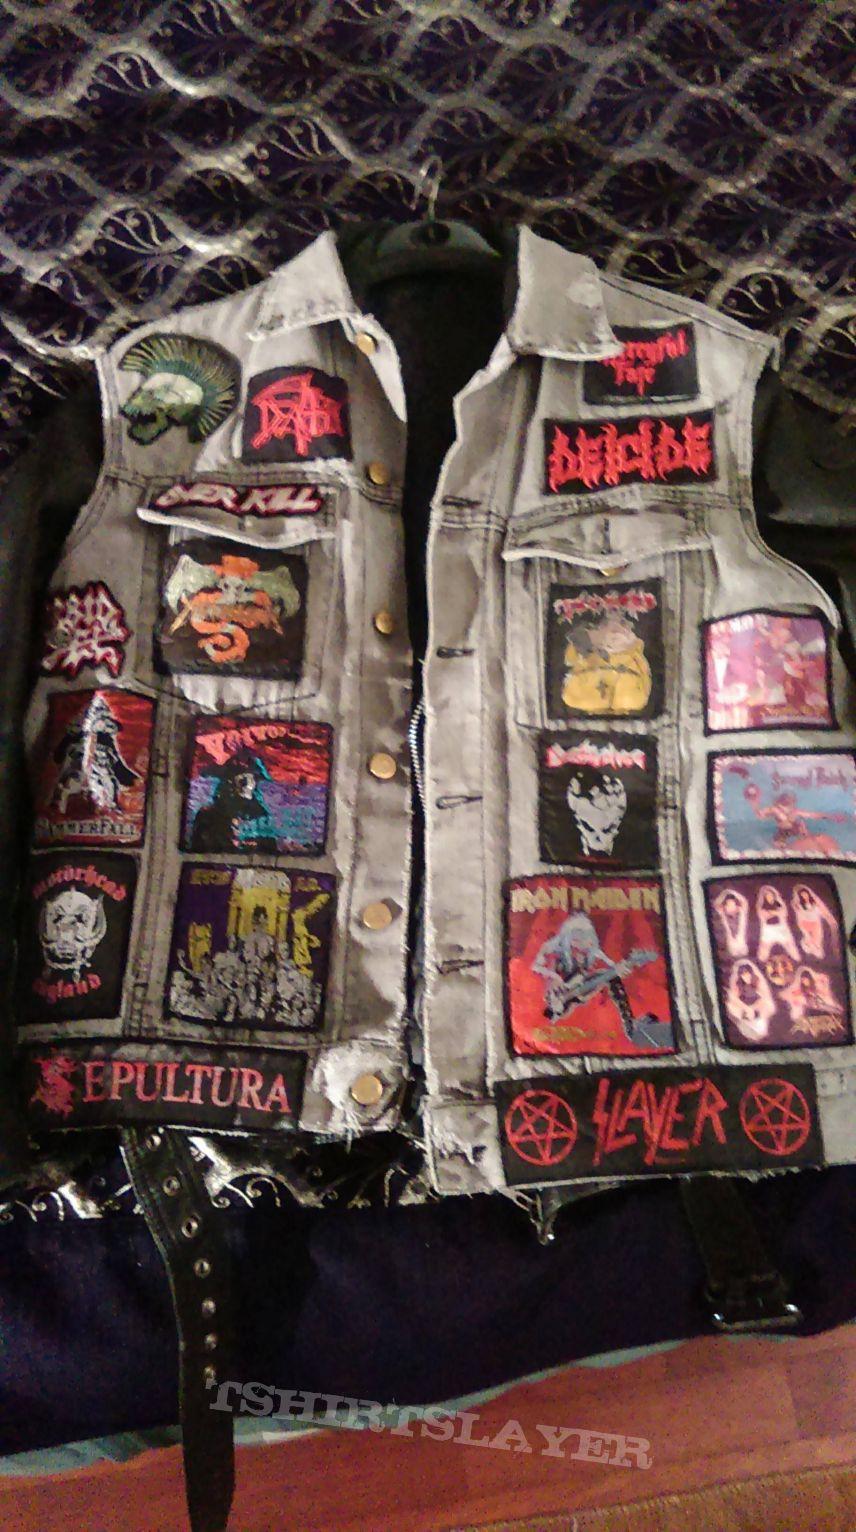 My early teenage Battle jacket